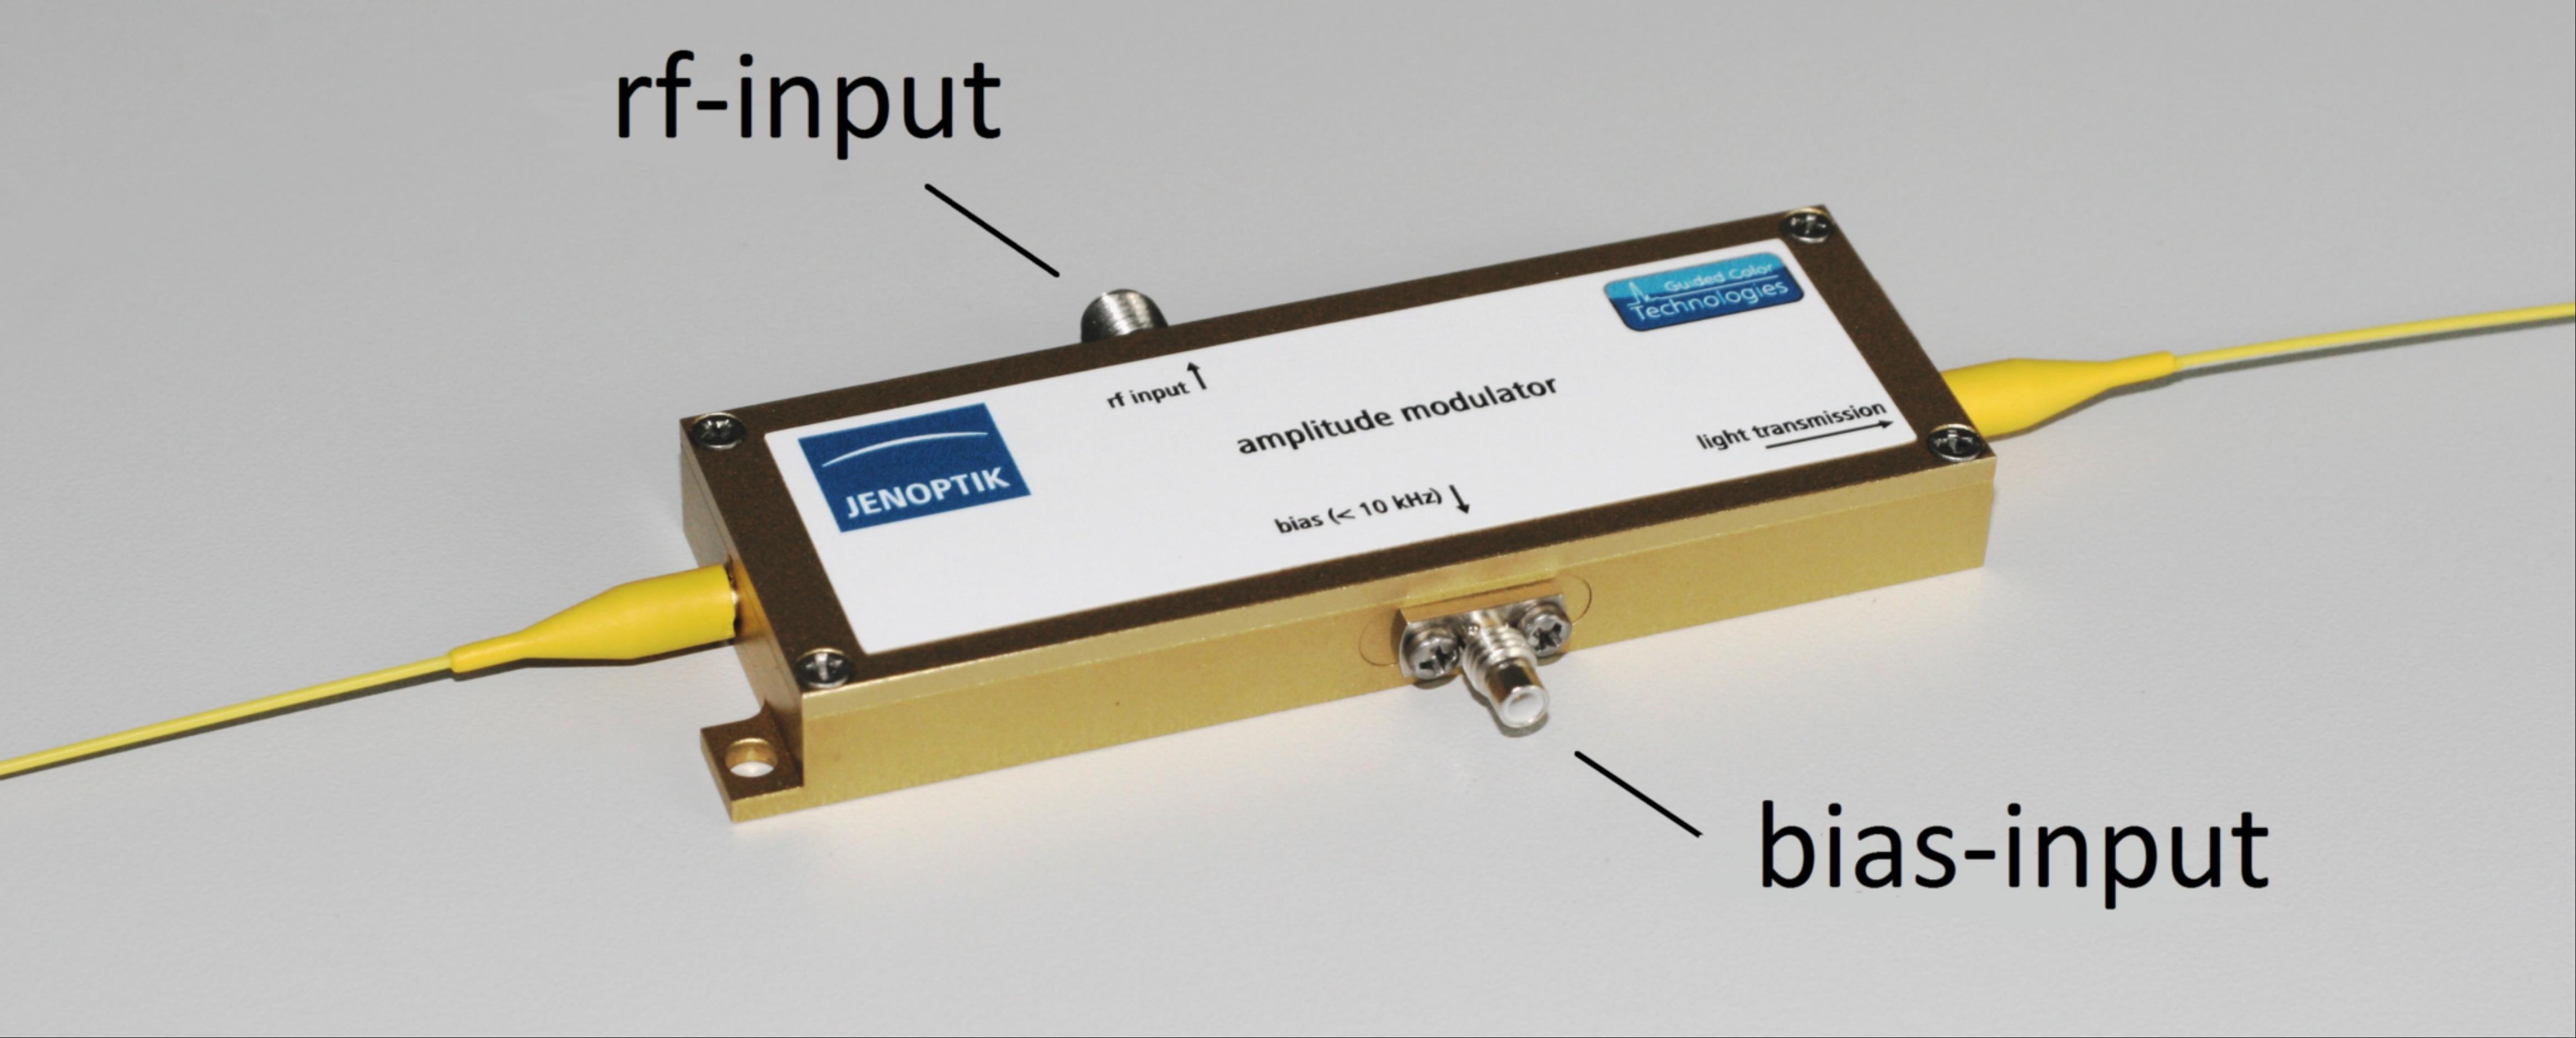 Modulator case with separated bias input